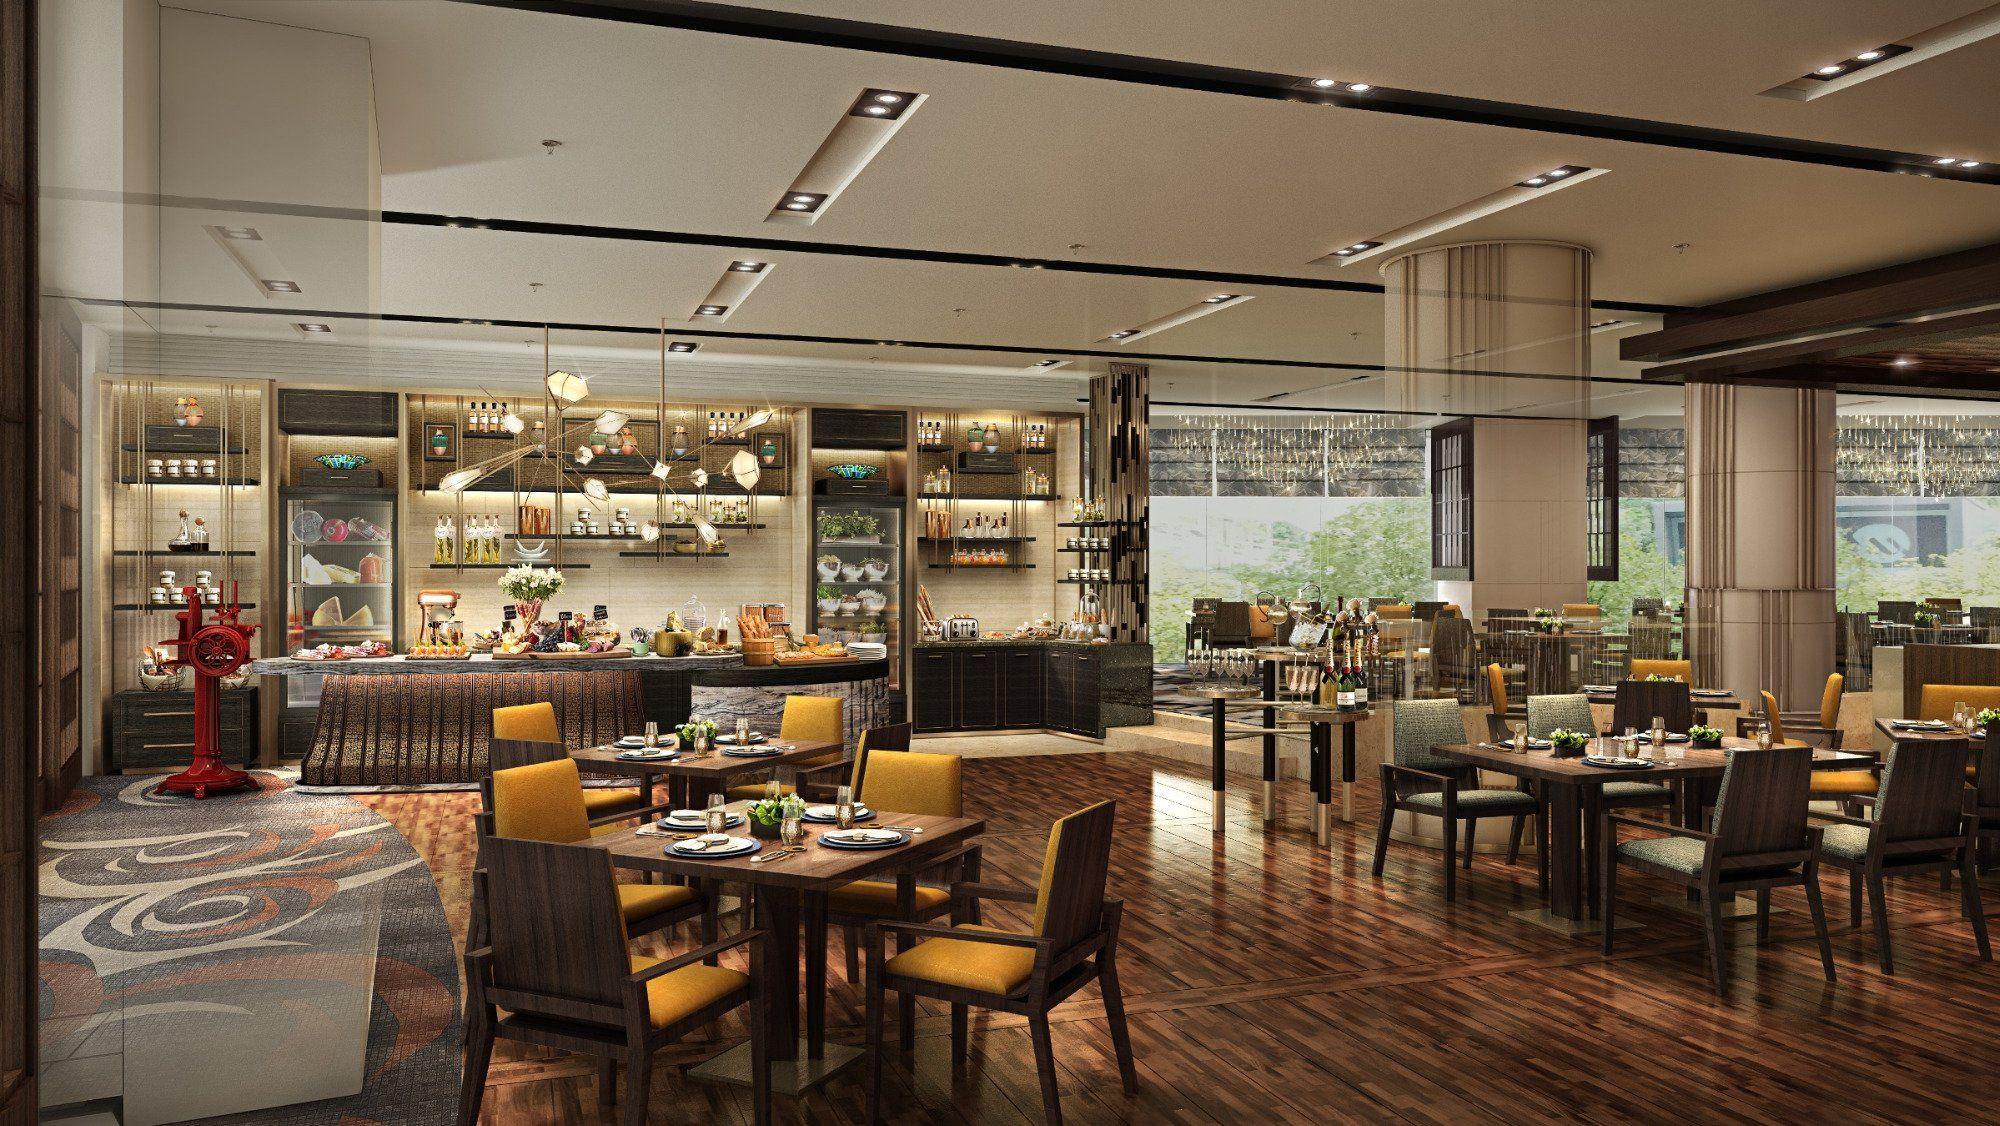 Flavorz All Day Dining Restaurant Shenzhen Civic Center Restaurant Reviews Photos Phone Number Tripadviso Restaurant Hotel Buffet Buffet Restaurant